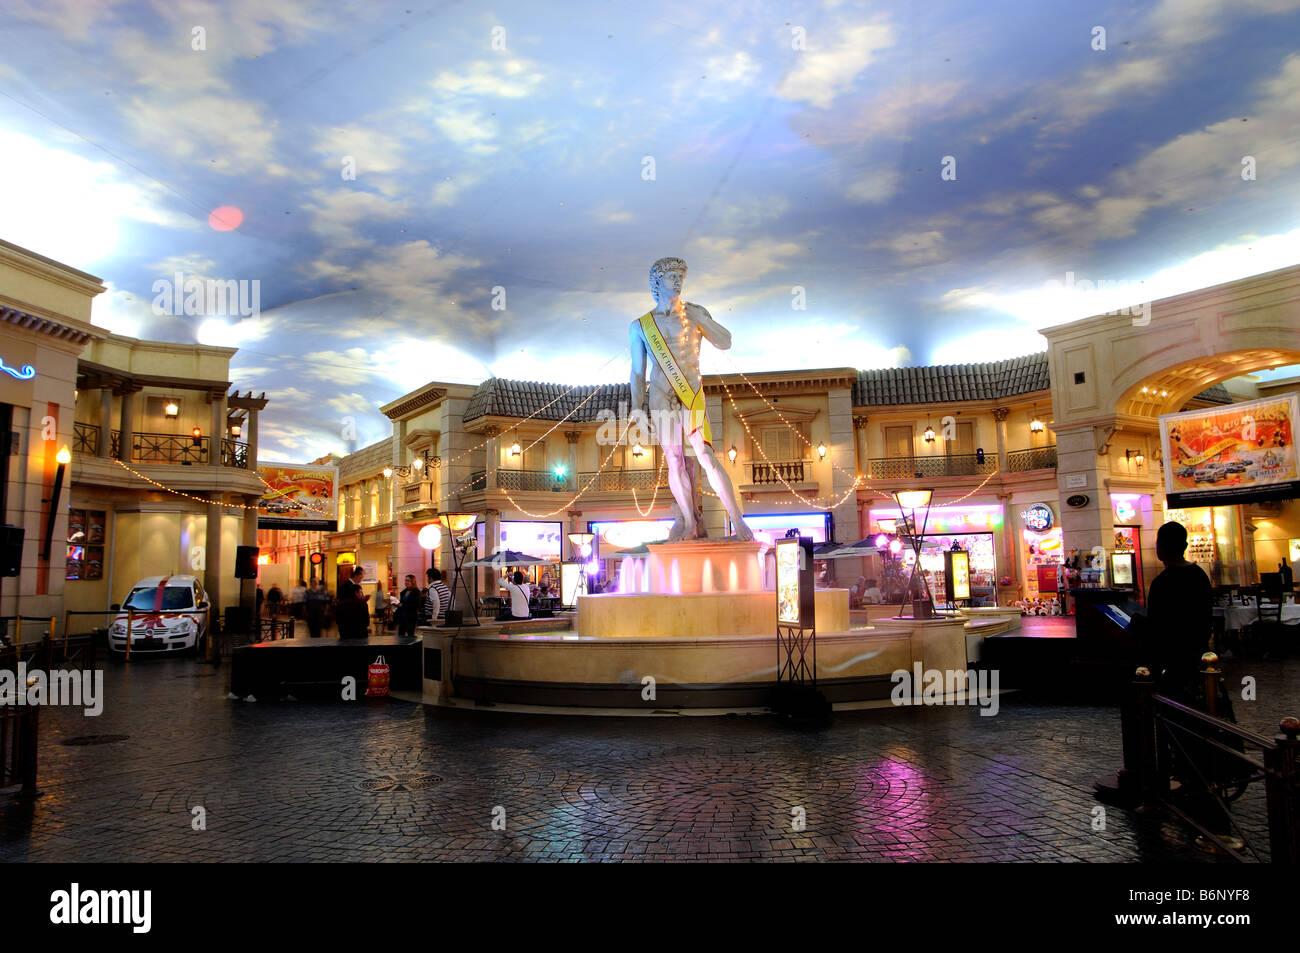 L'imperatore s palace mall Johannesburg Sudafrica Immagini Stock